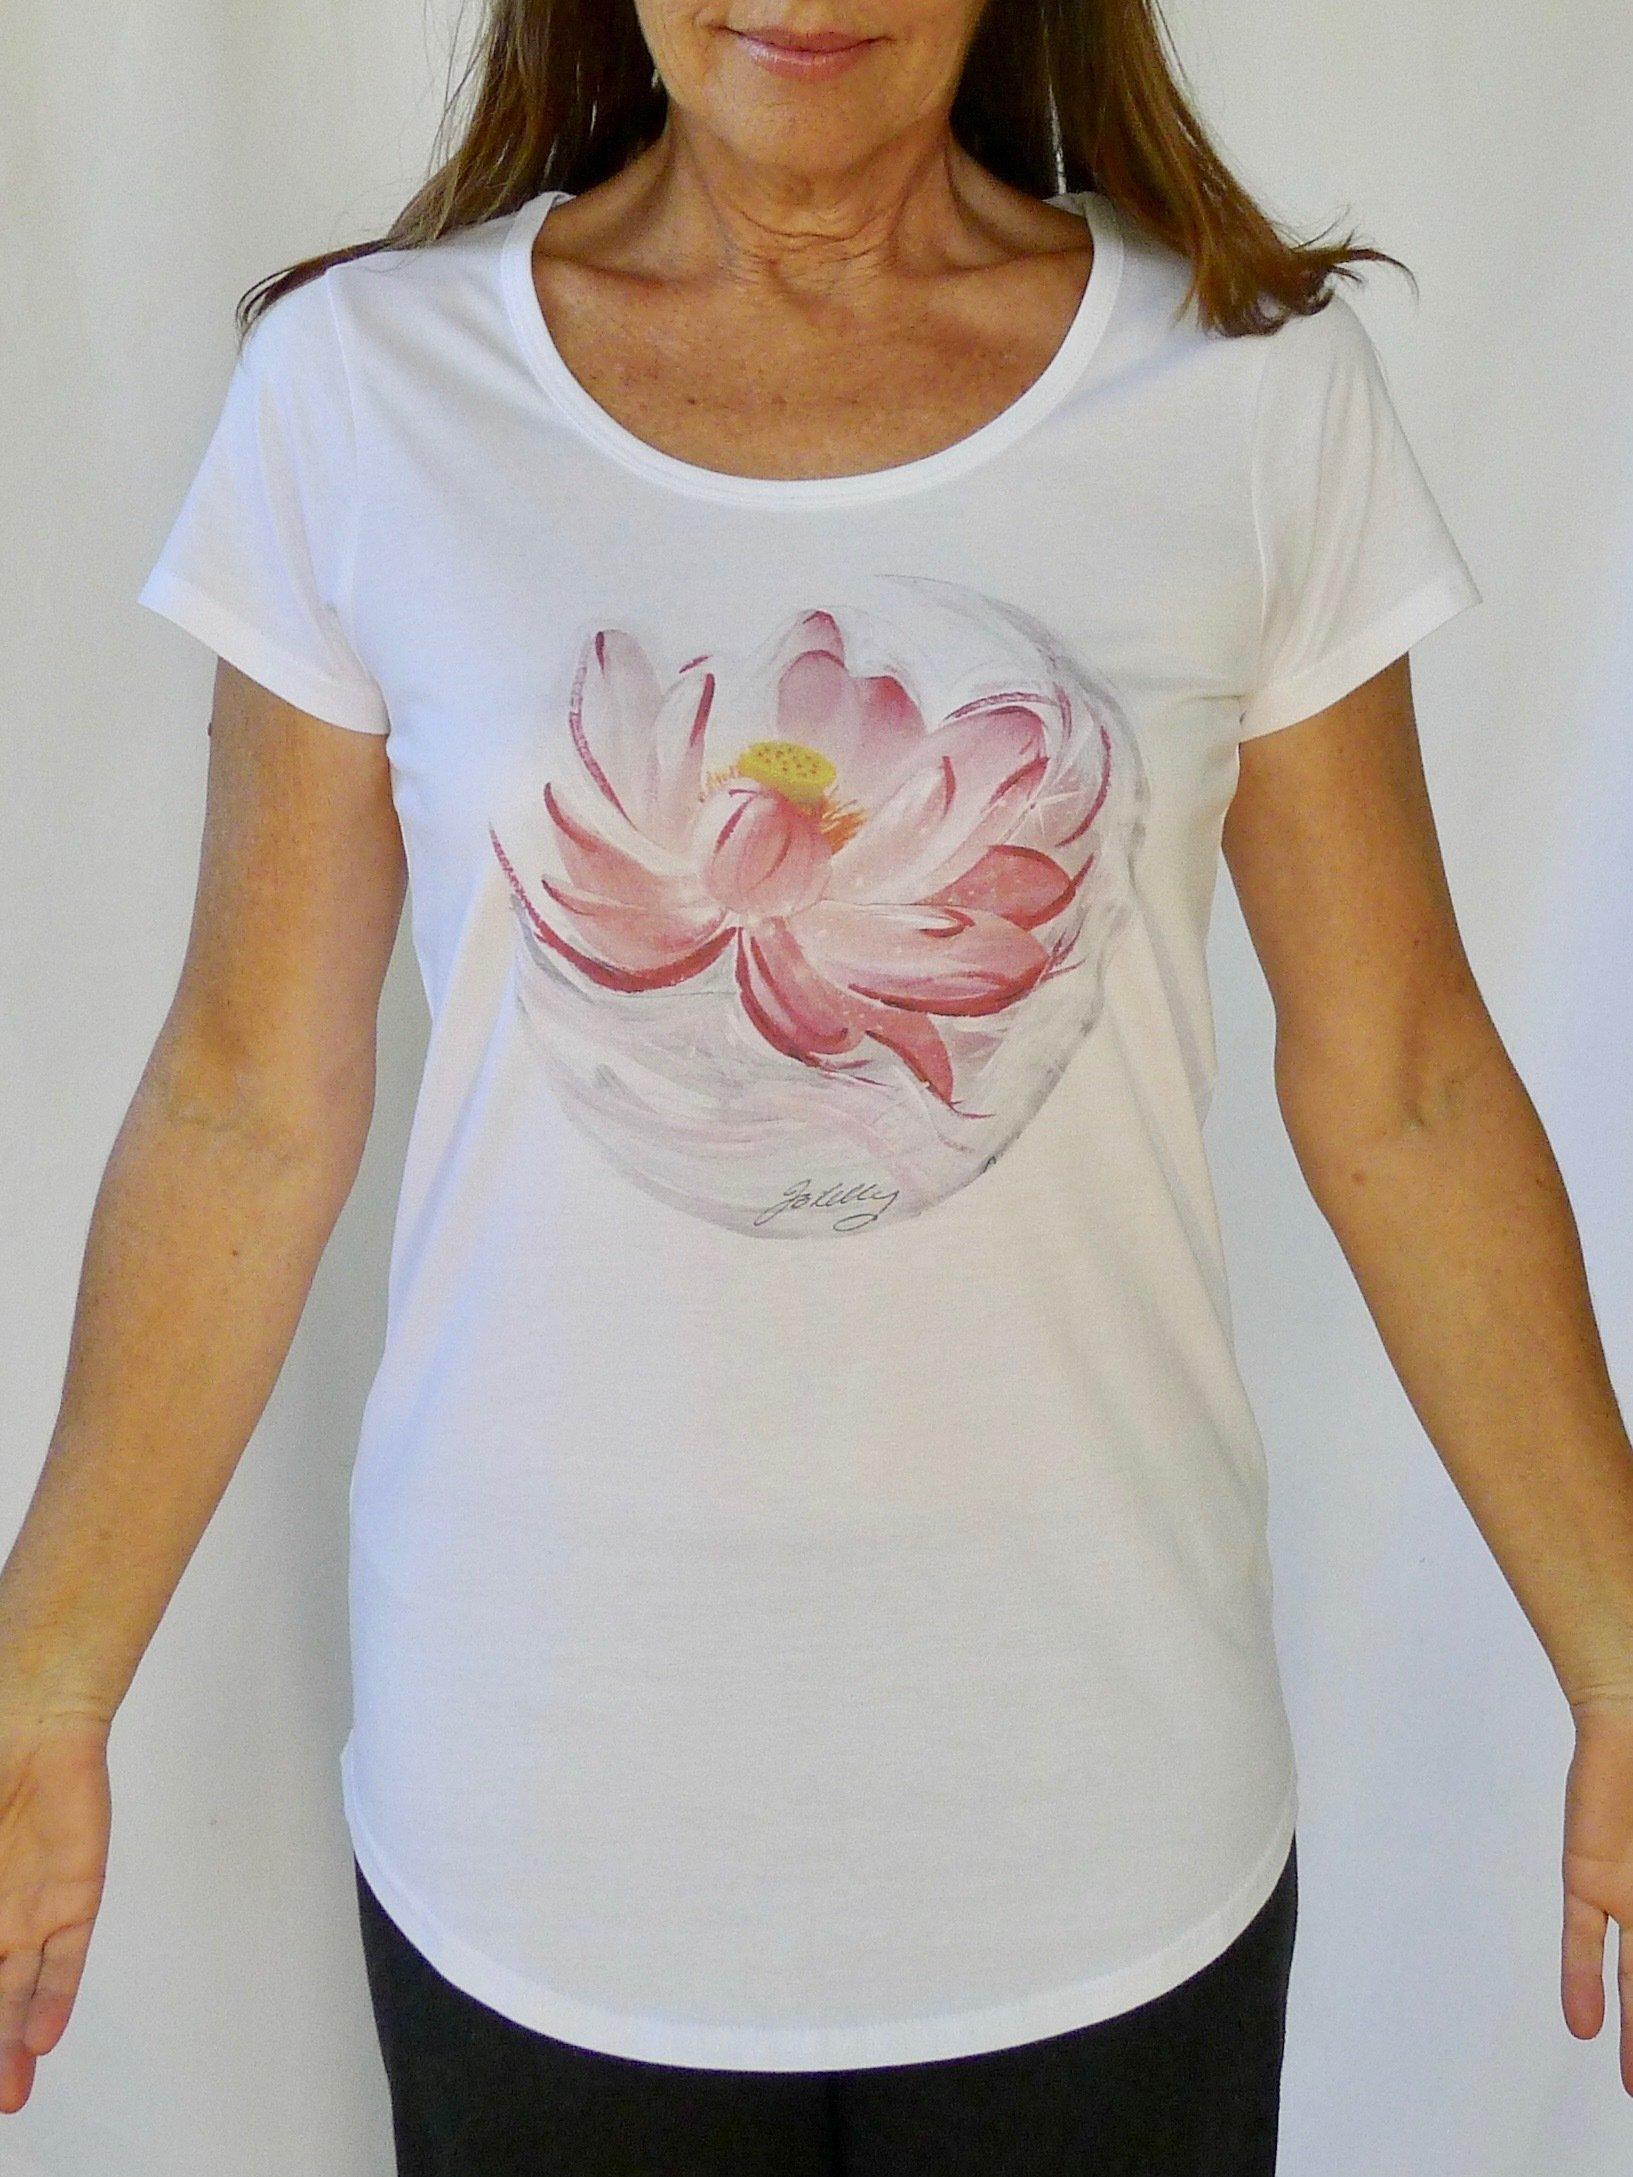 Lunar Lotus Yoga Tee 00008